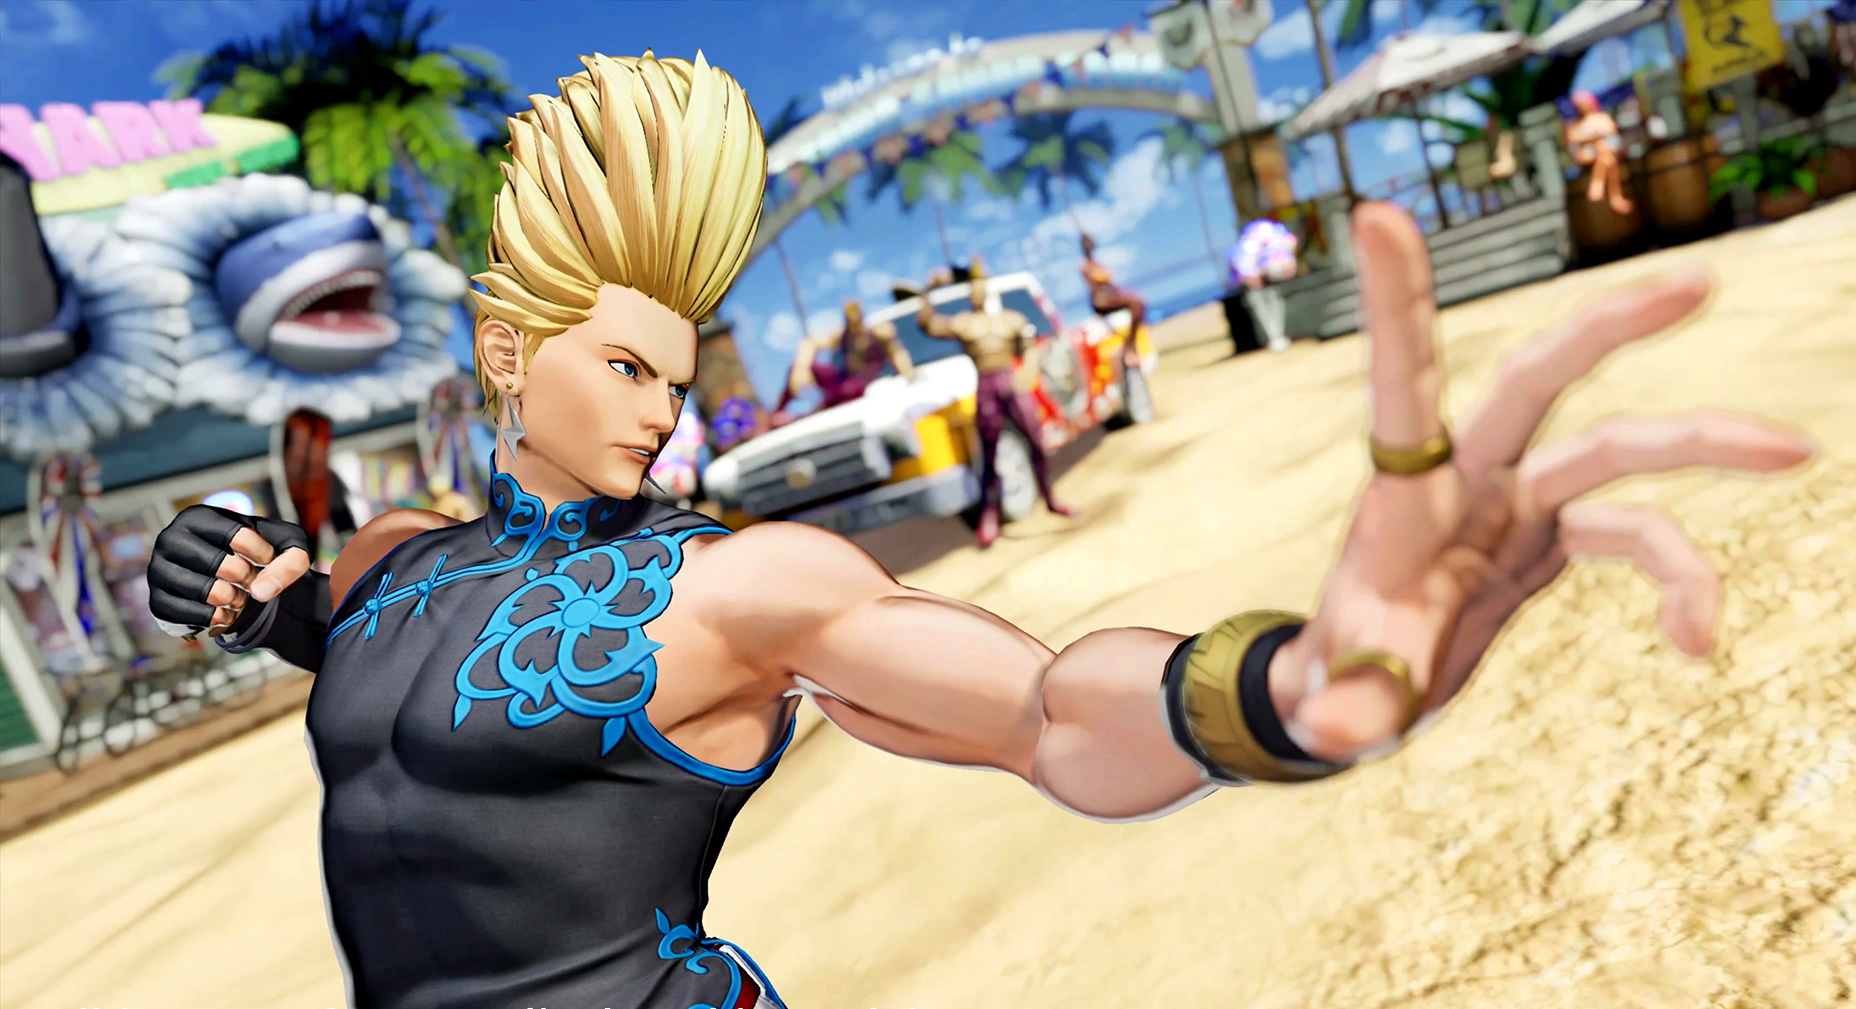 Свежий трейлер и скриншоты The King of Fighters XV посвятили Бенимару Никайдо